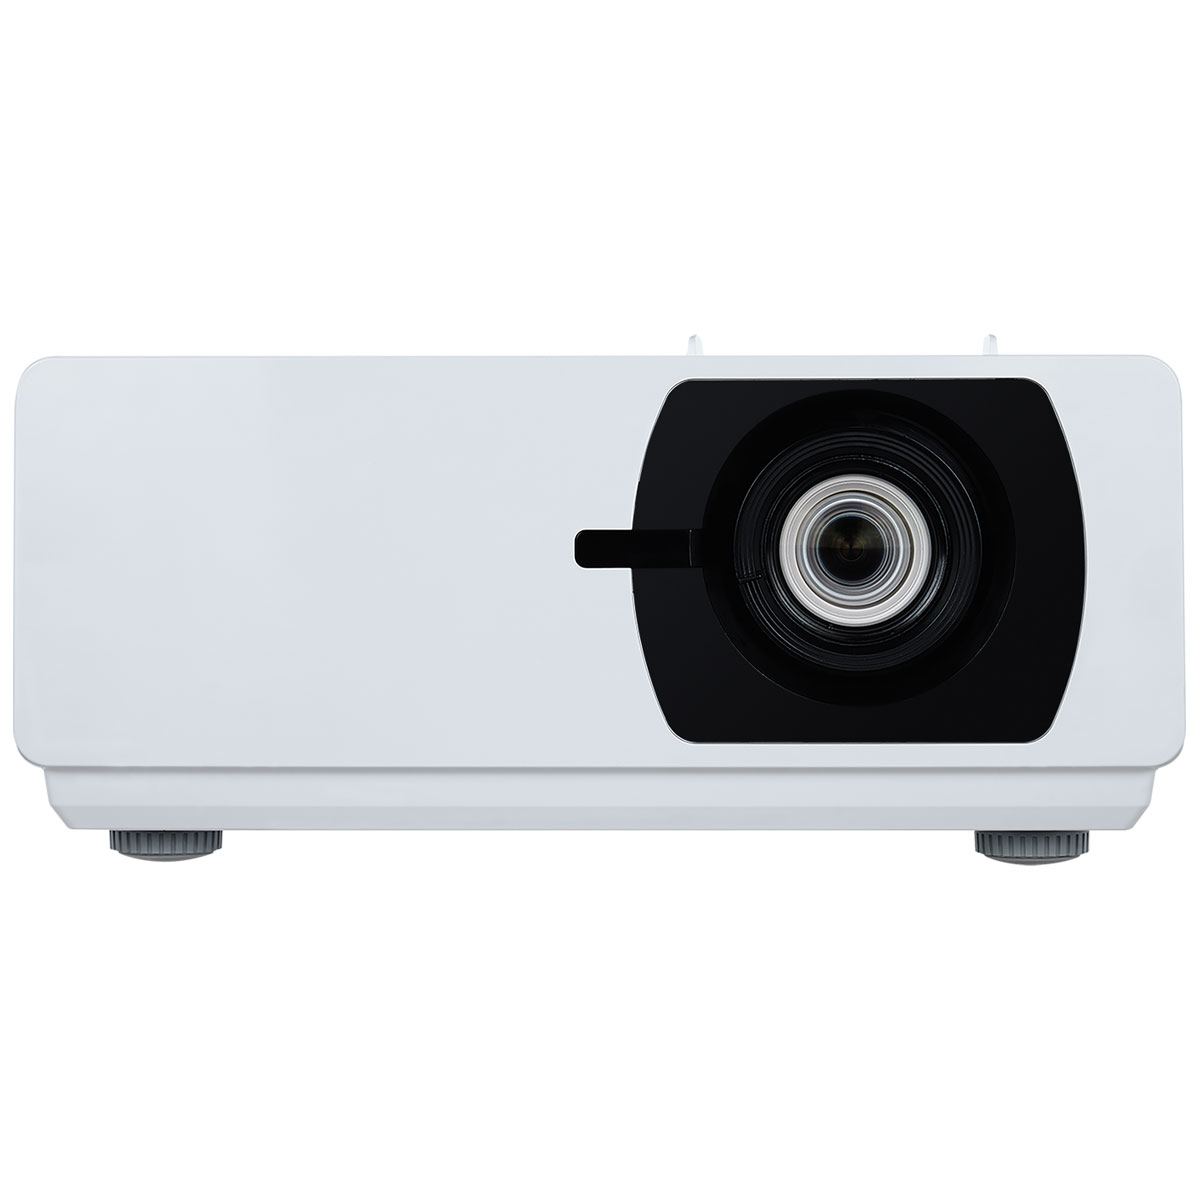 Vidéoprojecteur ViewSonic LS800HD Vidéoprojecteur DLP/Laser Full HD 3D Ready - 5000 Lumens - Lens Shift H/V - RJ45 HDBaseT - 3x HDMI - Orientation 360°/Mode portrait - 2 x 5 Watts